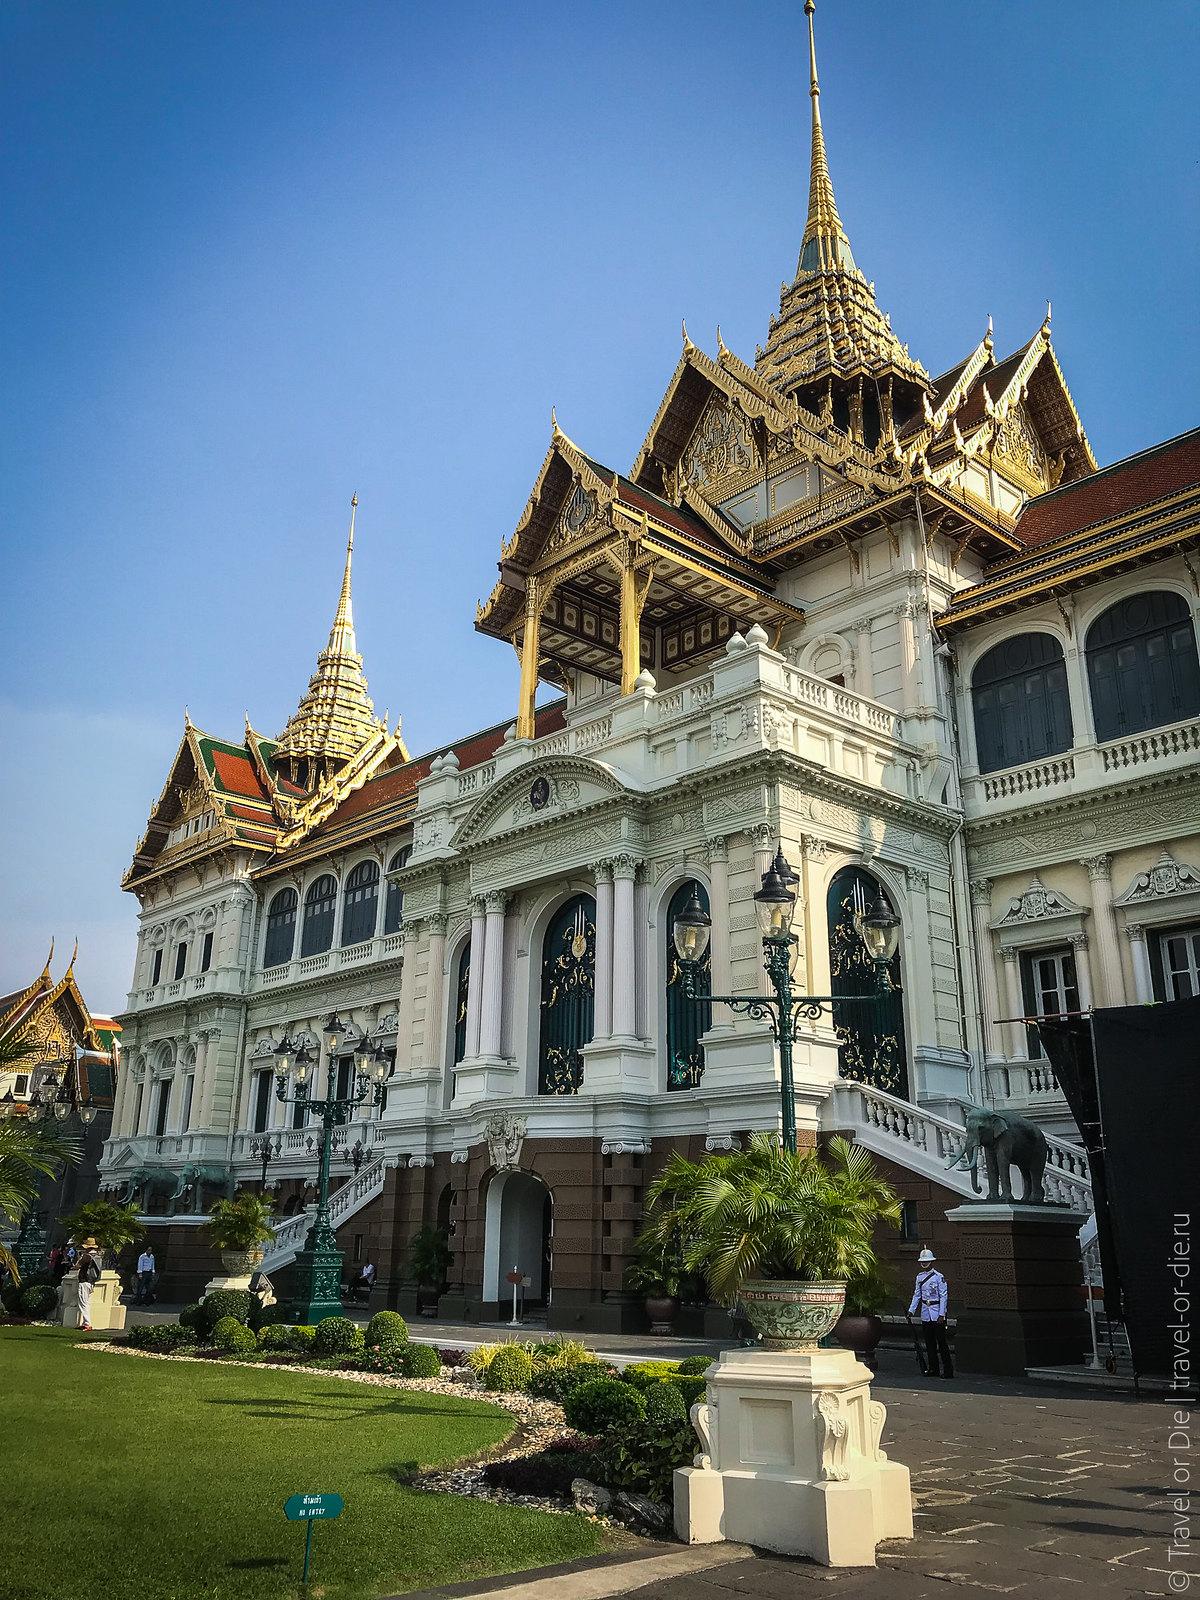 Grand-Palace-Bangkok-Королевский-дворец-Бангкок-9202